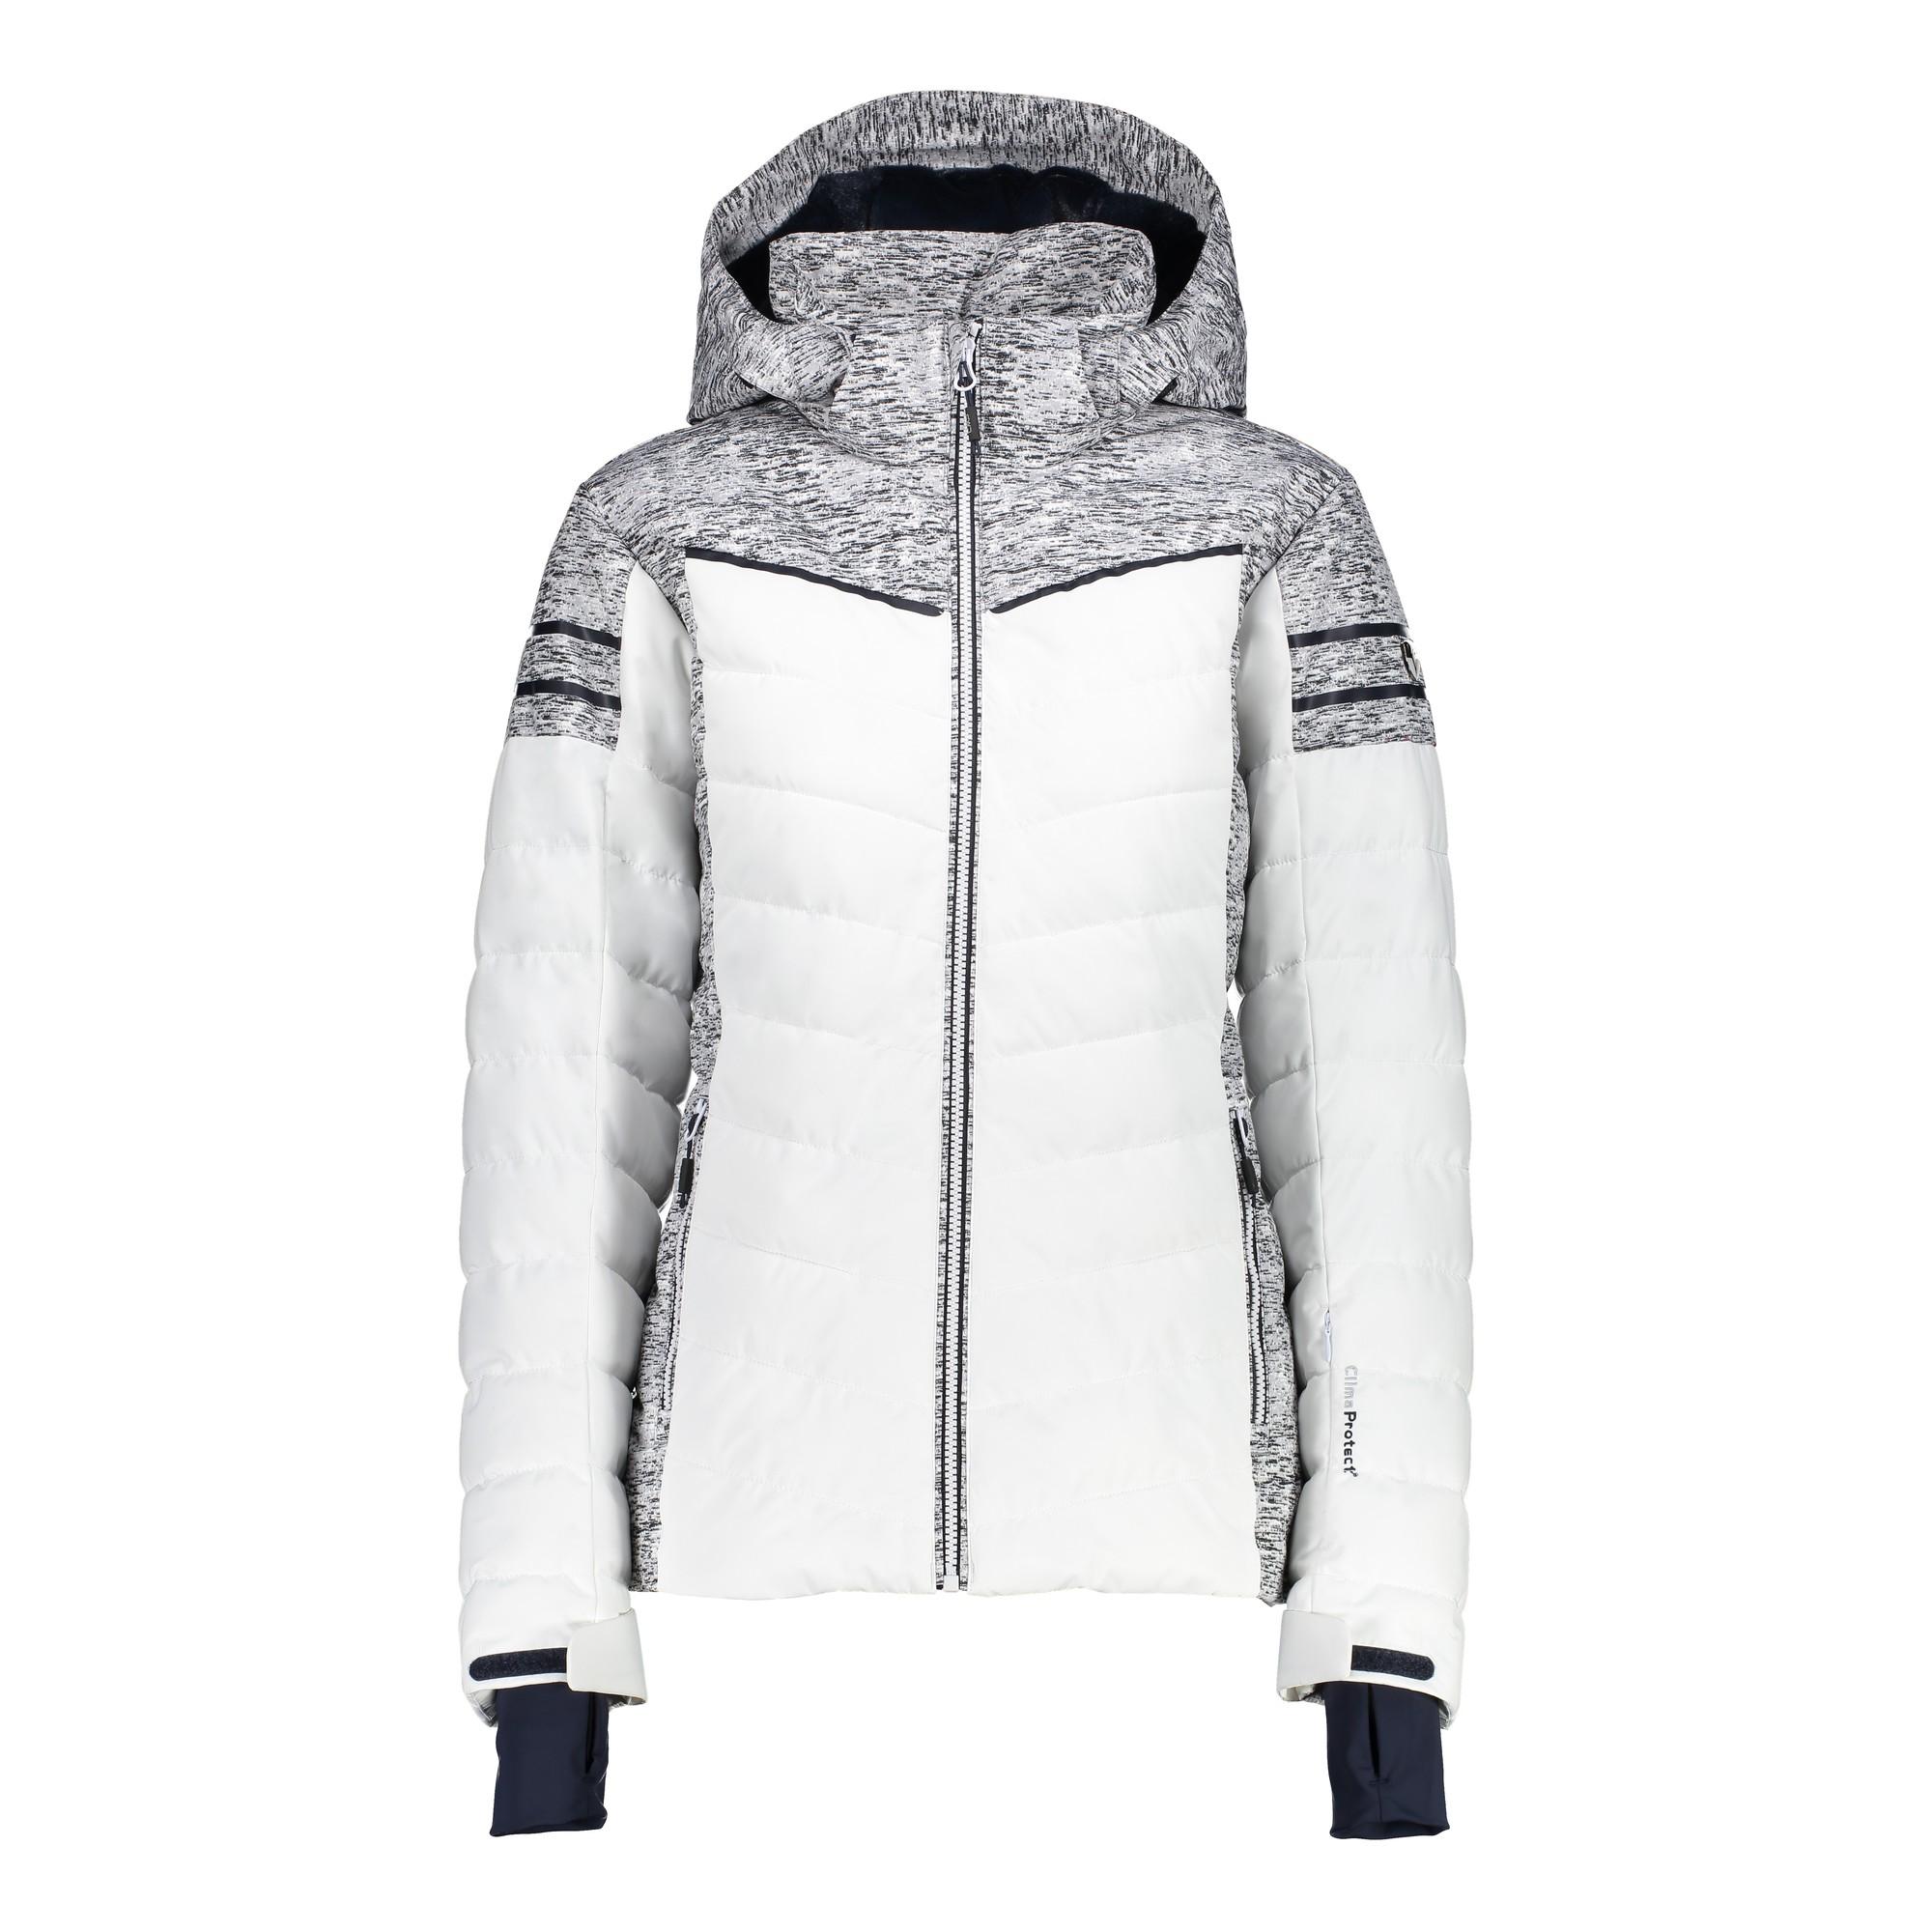 CMP Herren Thinsulate Twill 5000 Skijacke Jacke